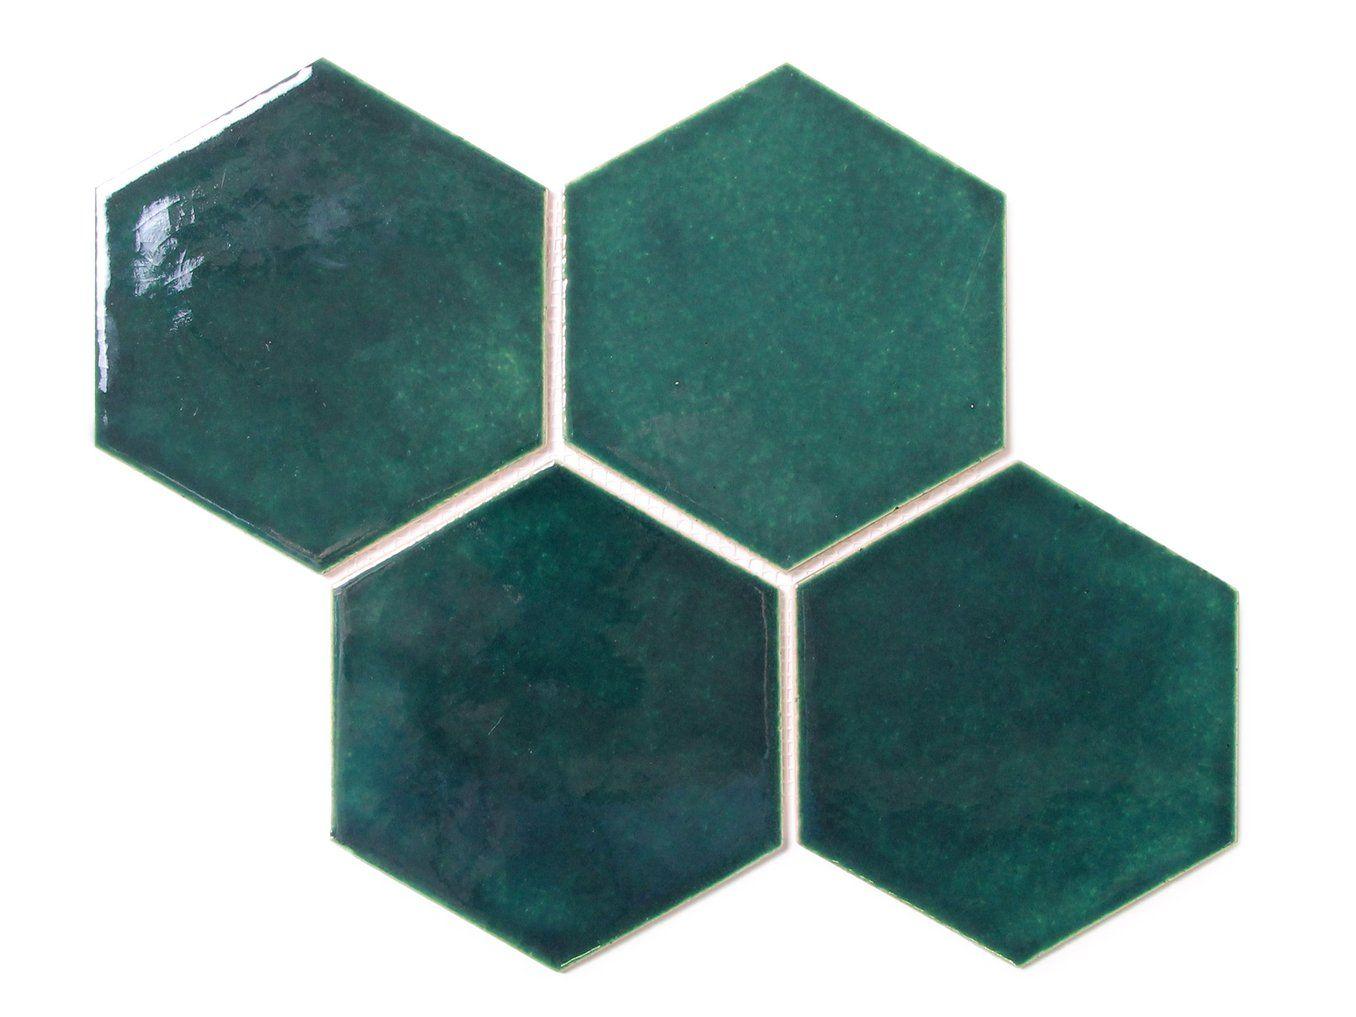 Large Teal Hexagon Tile Teal Hexagon Ceramic Tile Mercury Mosaics Mercury Mosaics Hexagon Tiles Blue Green Tile